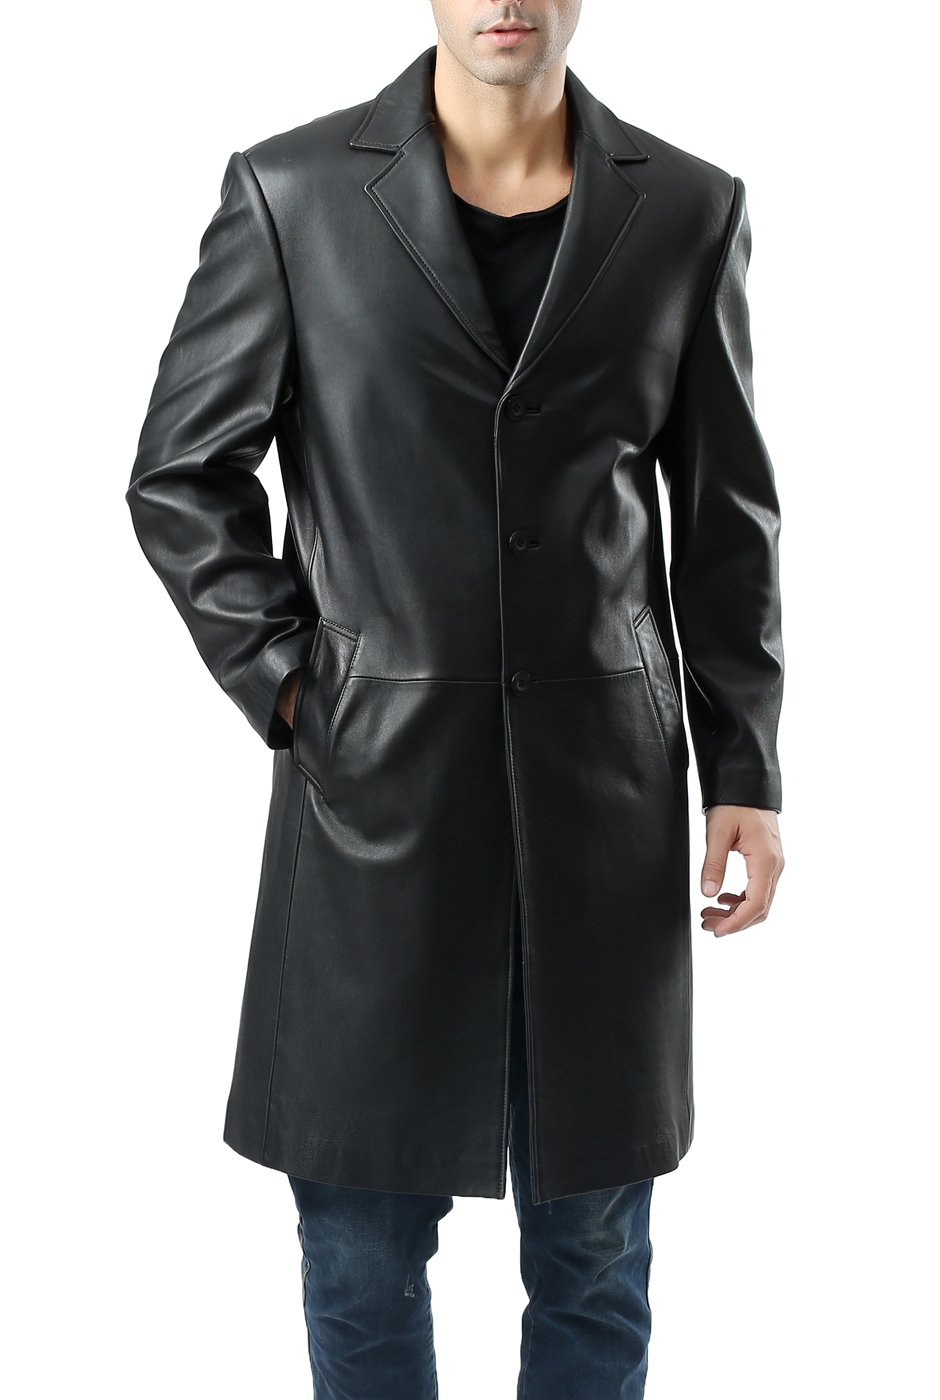 BGSD Men's Classic New Zealand Lambskin Leather Long Walking Coat (Regular and Big & Tall and Short Sizes)